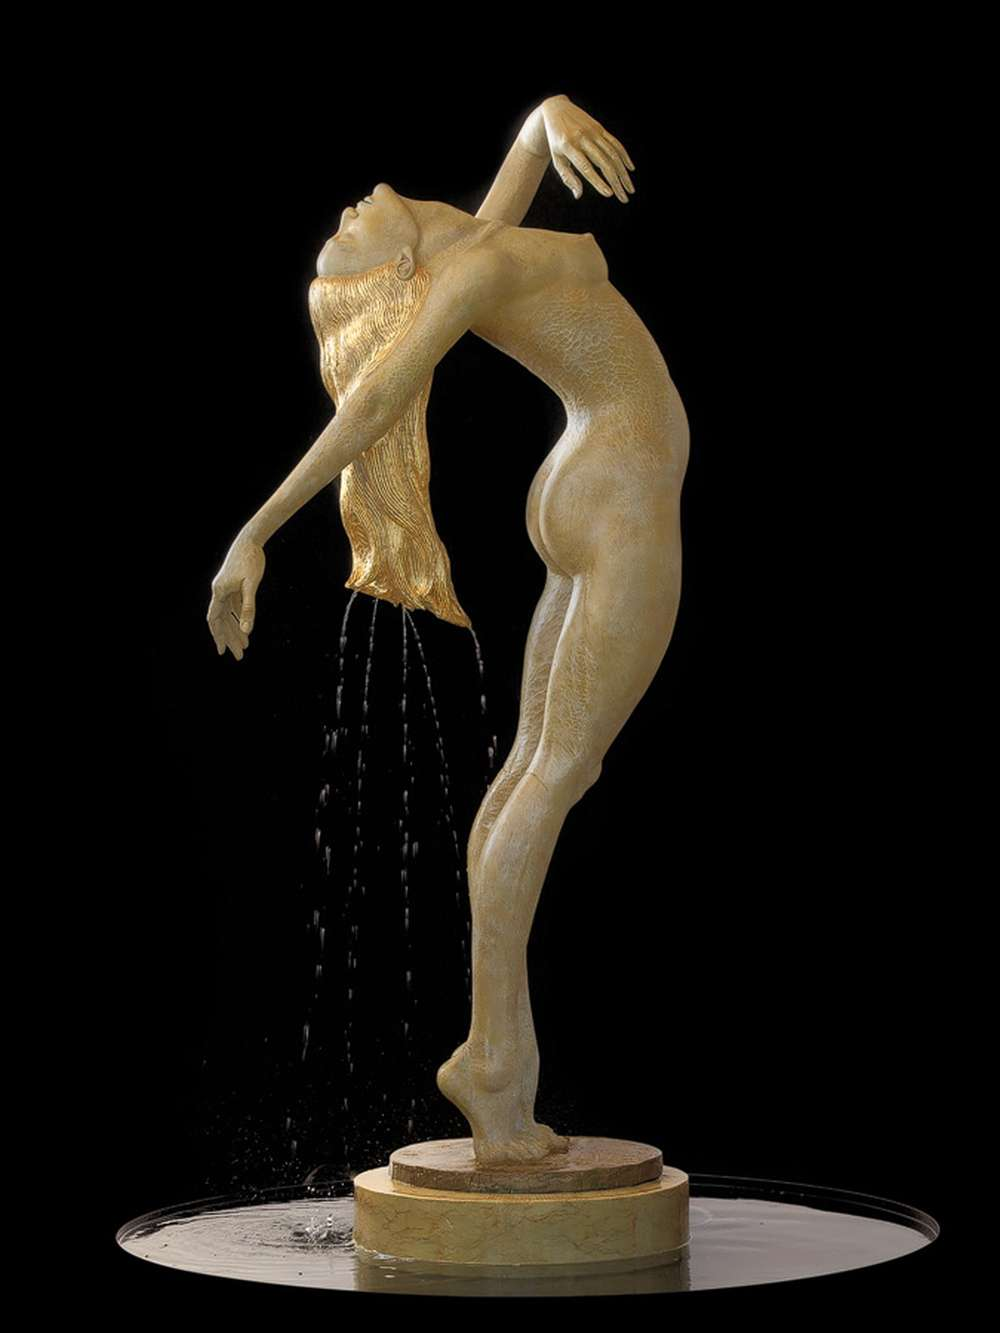 Springbrunnen, Bronzeskulptur Menade von Malgorzata Chodakowska